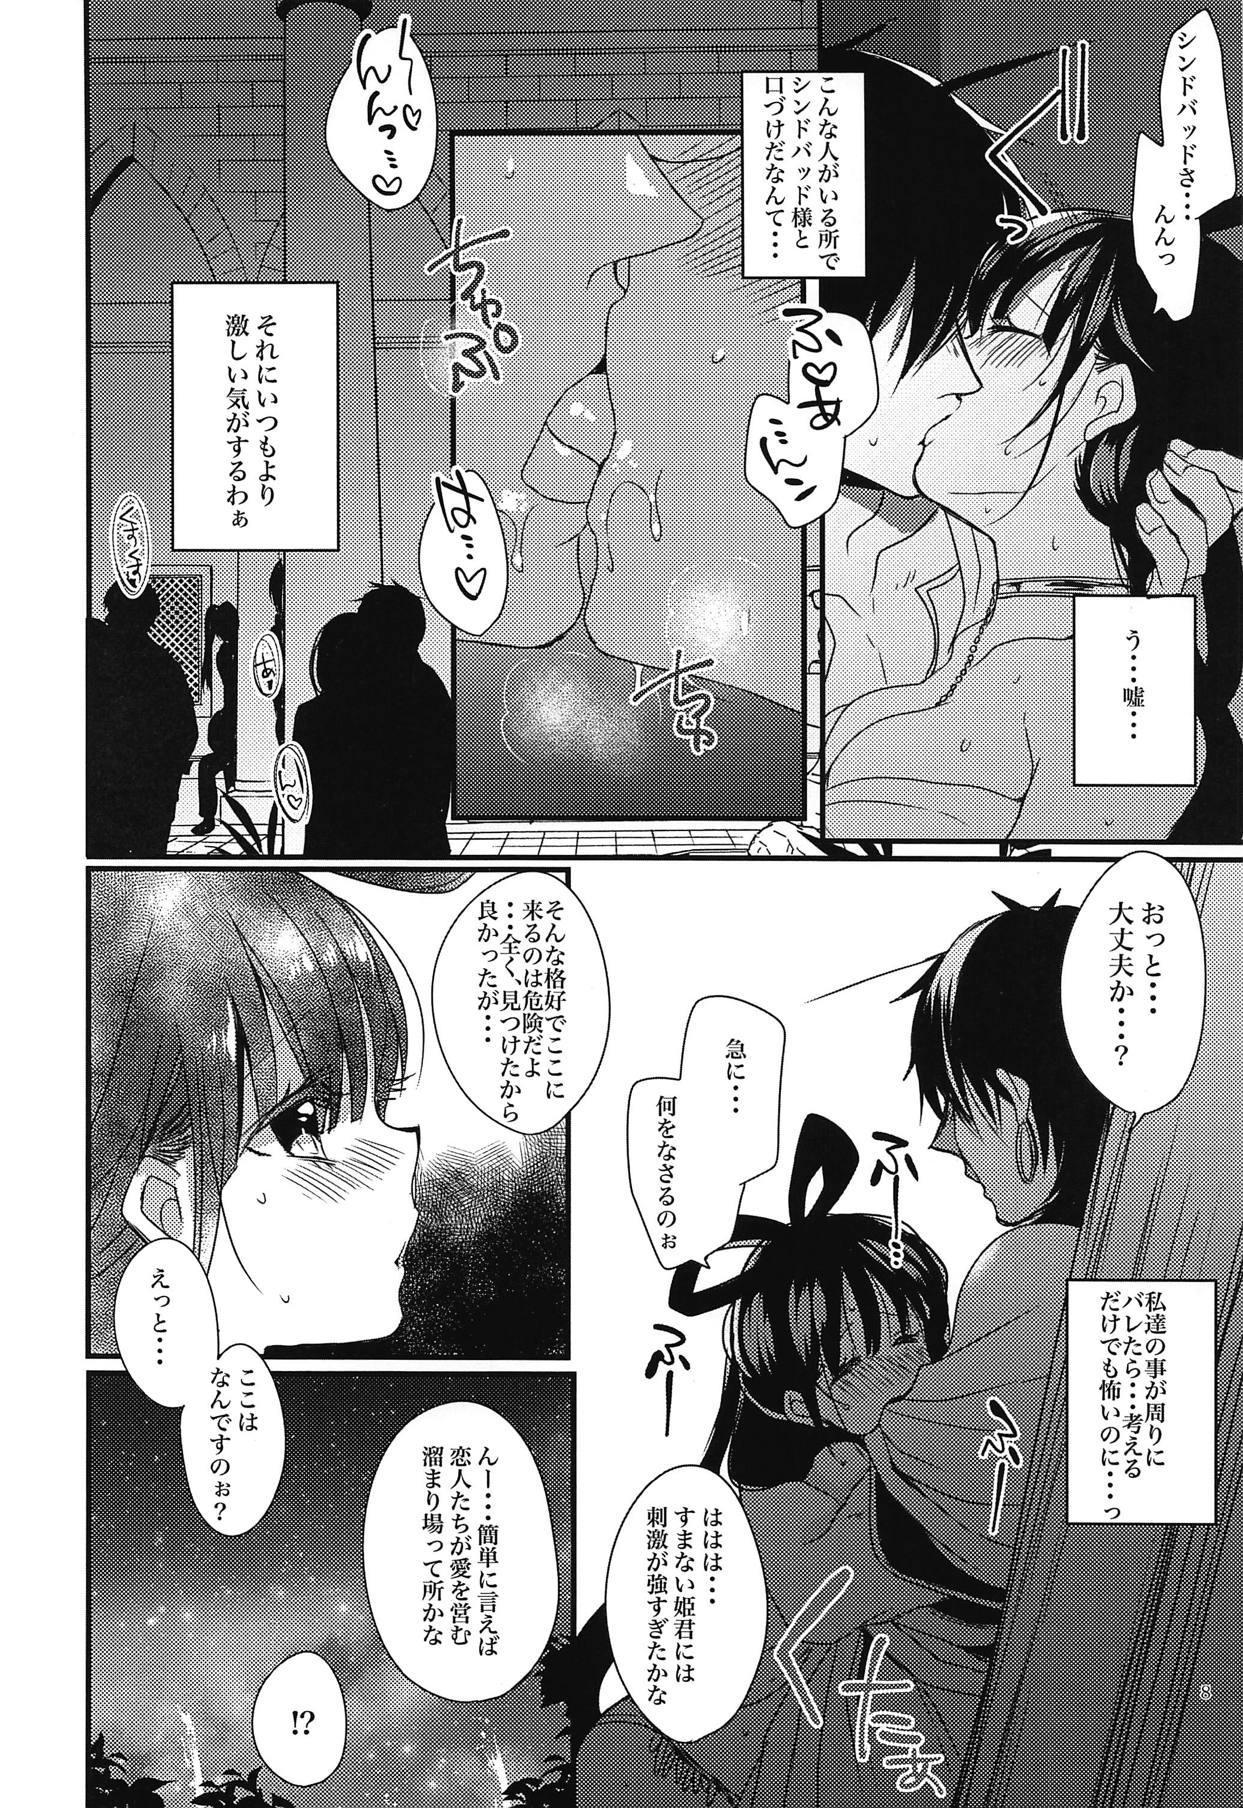 Himegimi wa Koyoi mo Ou-sama to 6